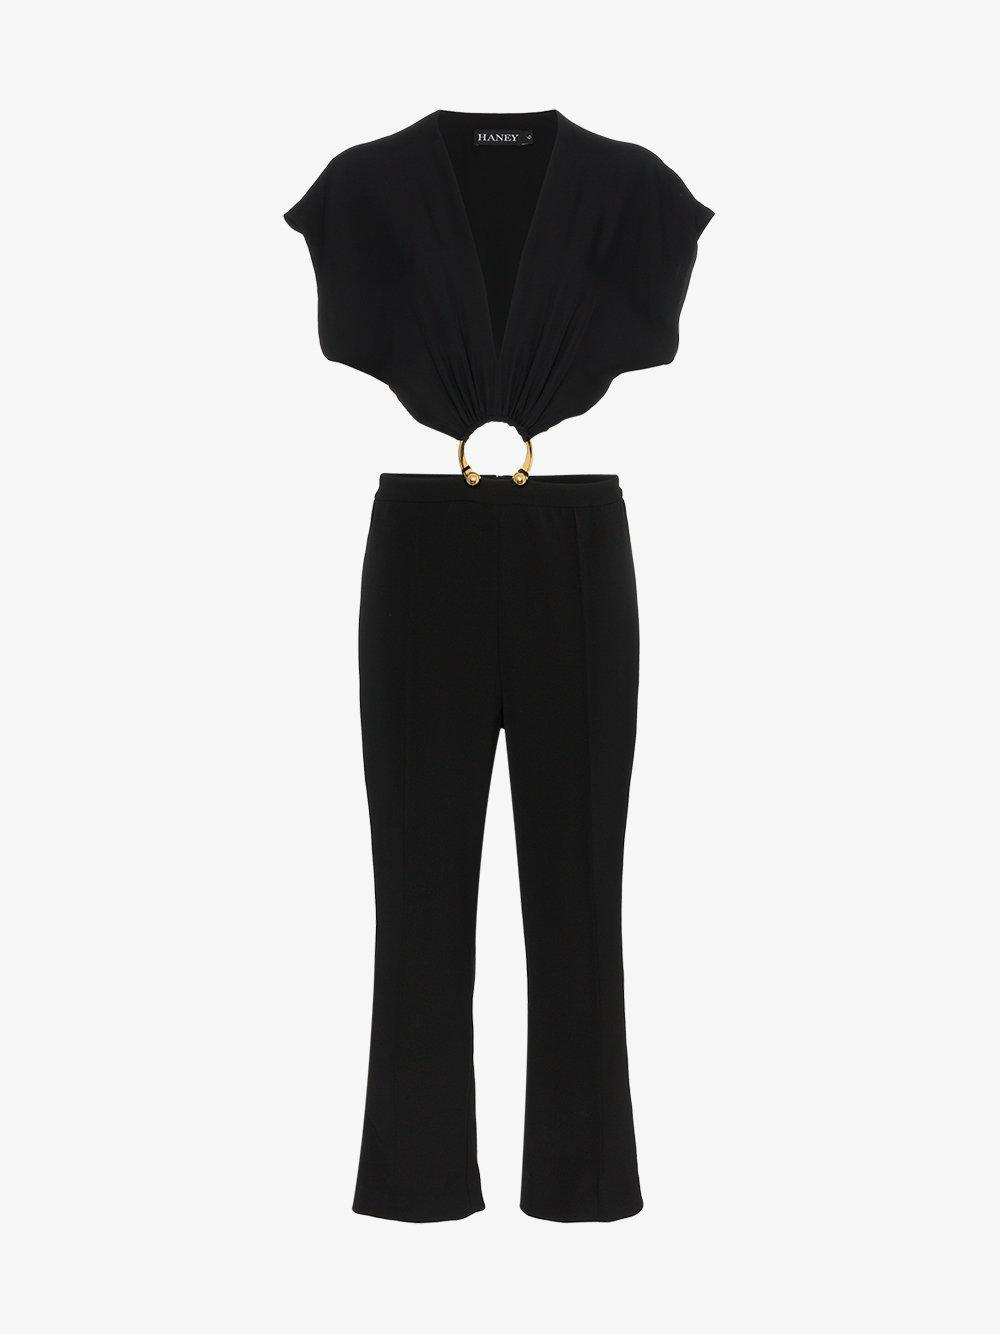 austin silk jumpsuit - Black Haney Enjoy Sale Online Discount Best Sale iMow4HVT